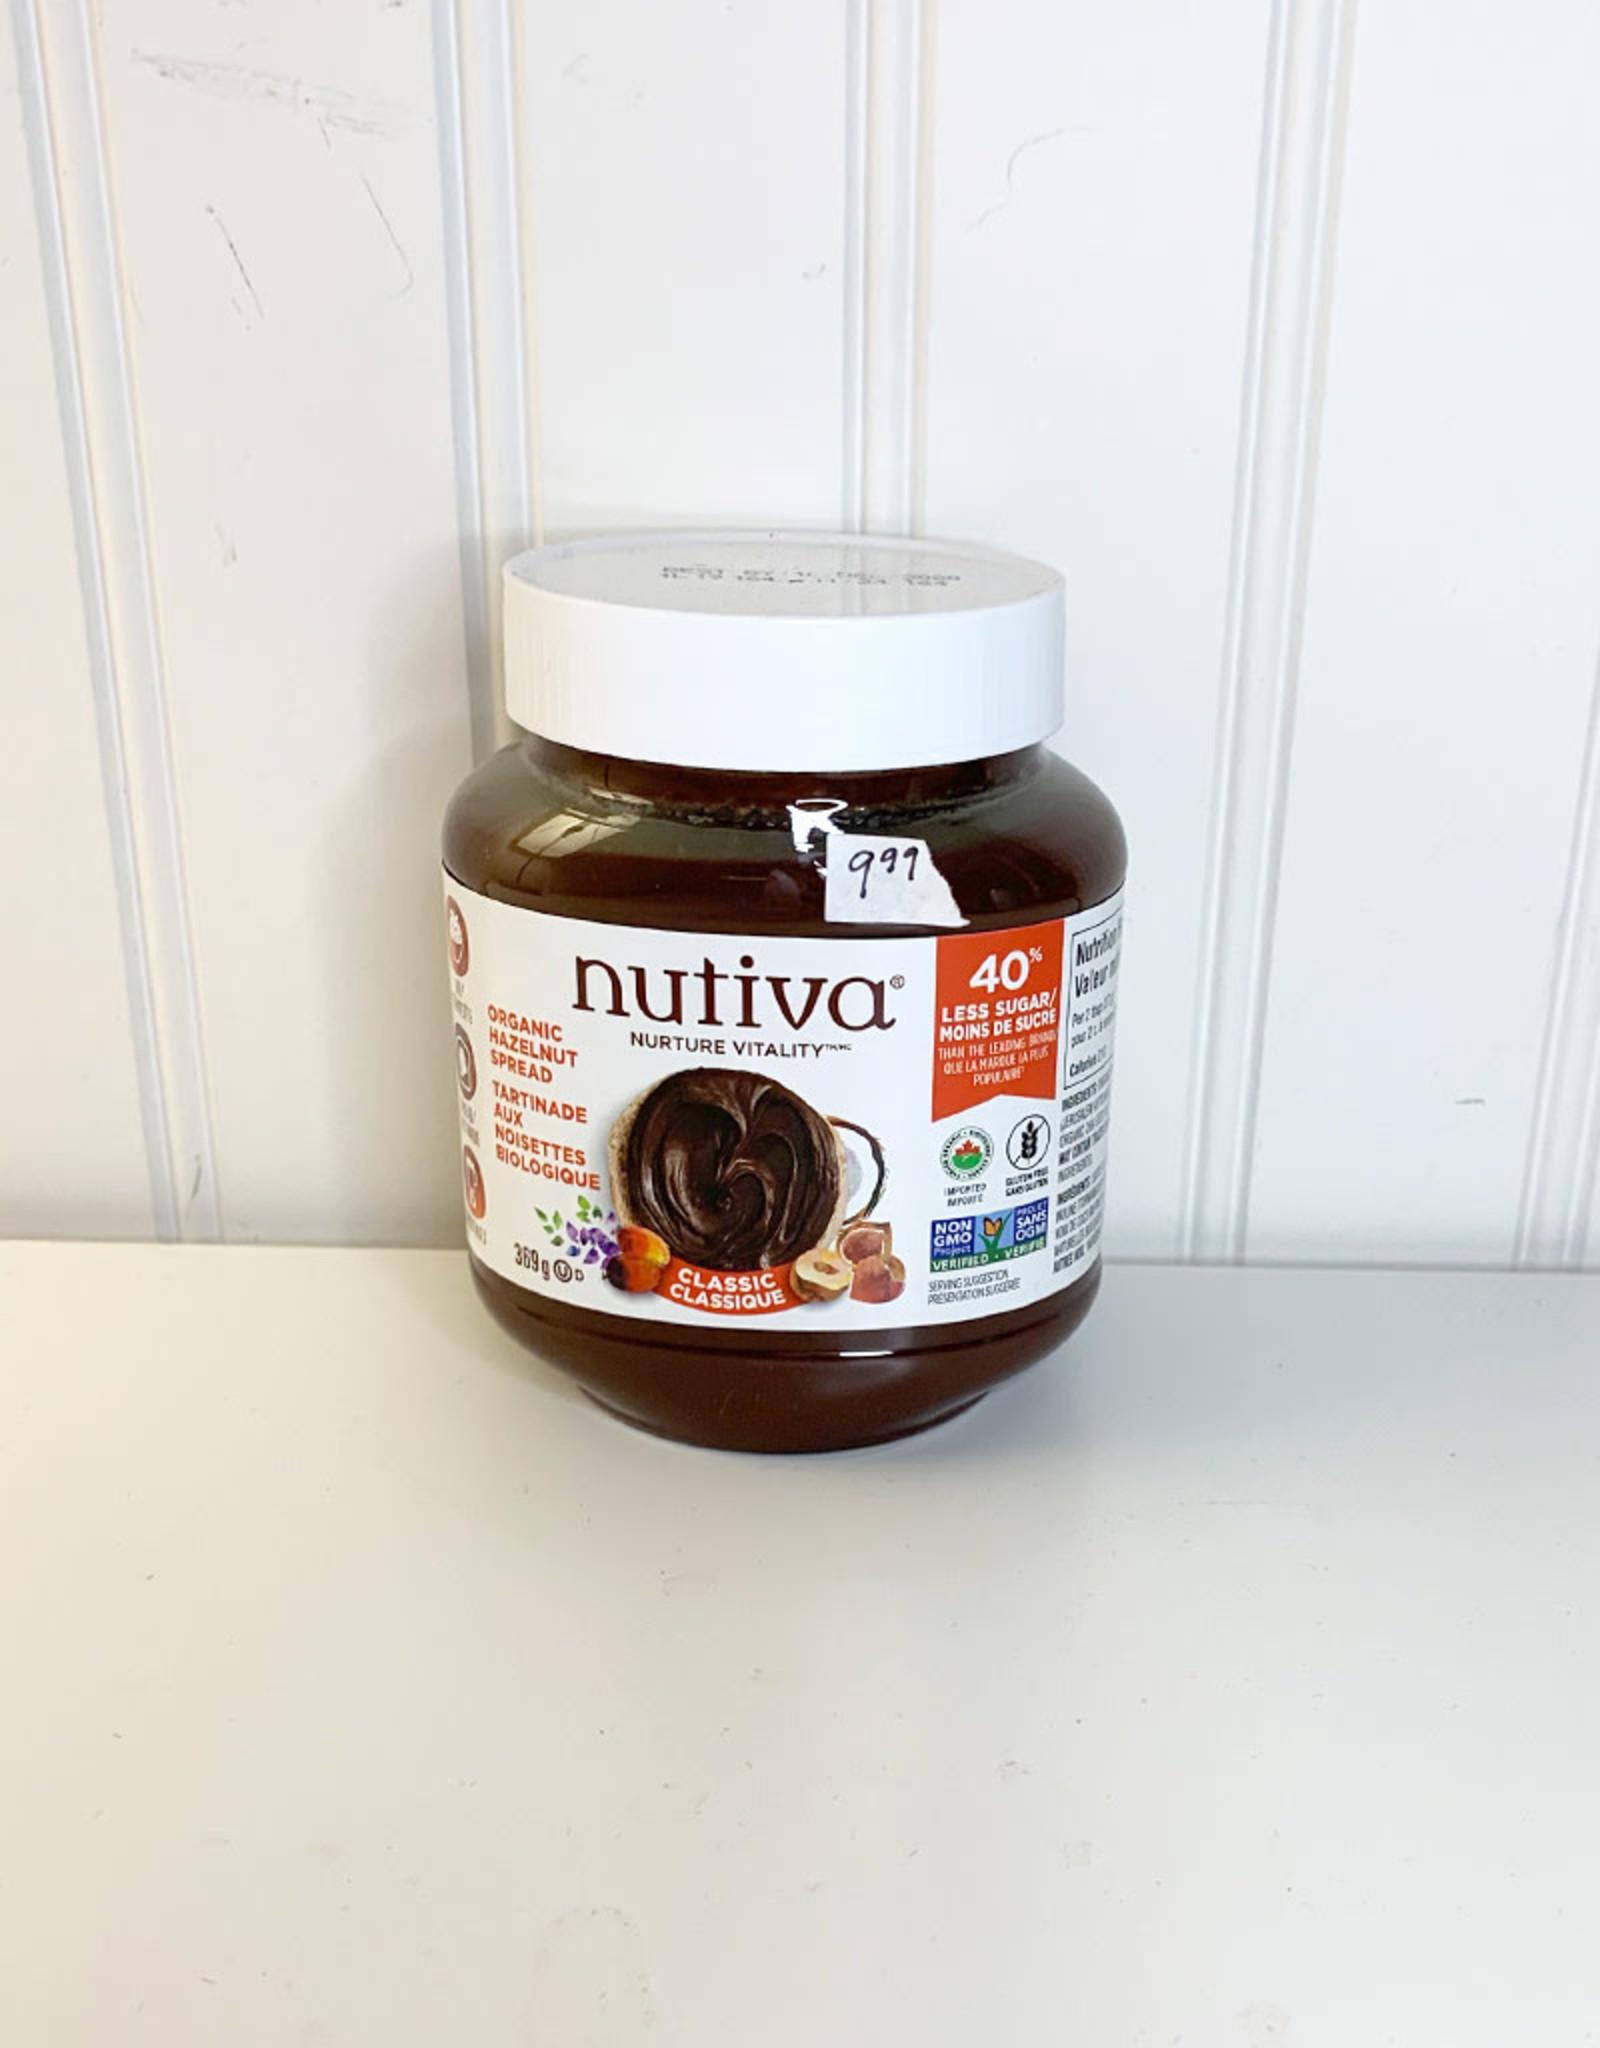 Nutiva Nutiva - Hazelnut Spread, Classic (369g)